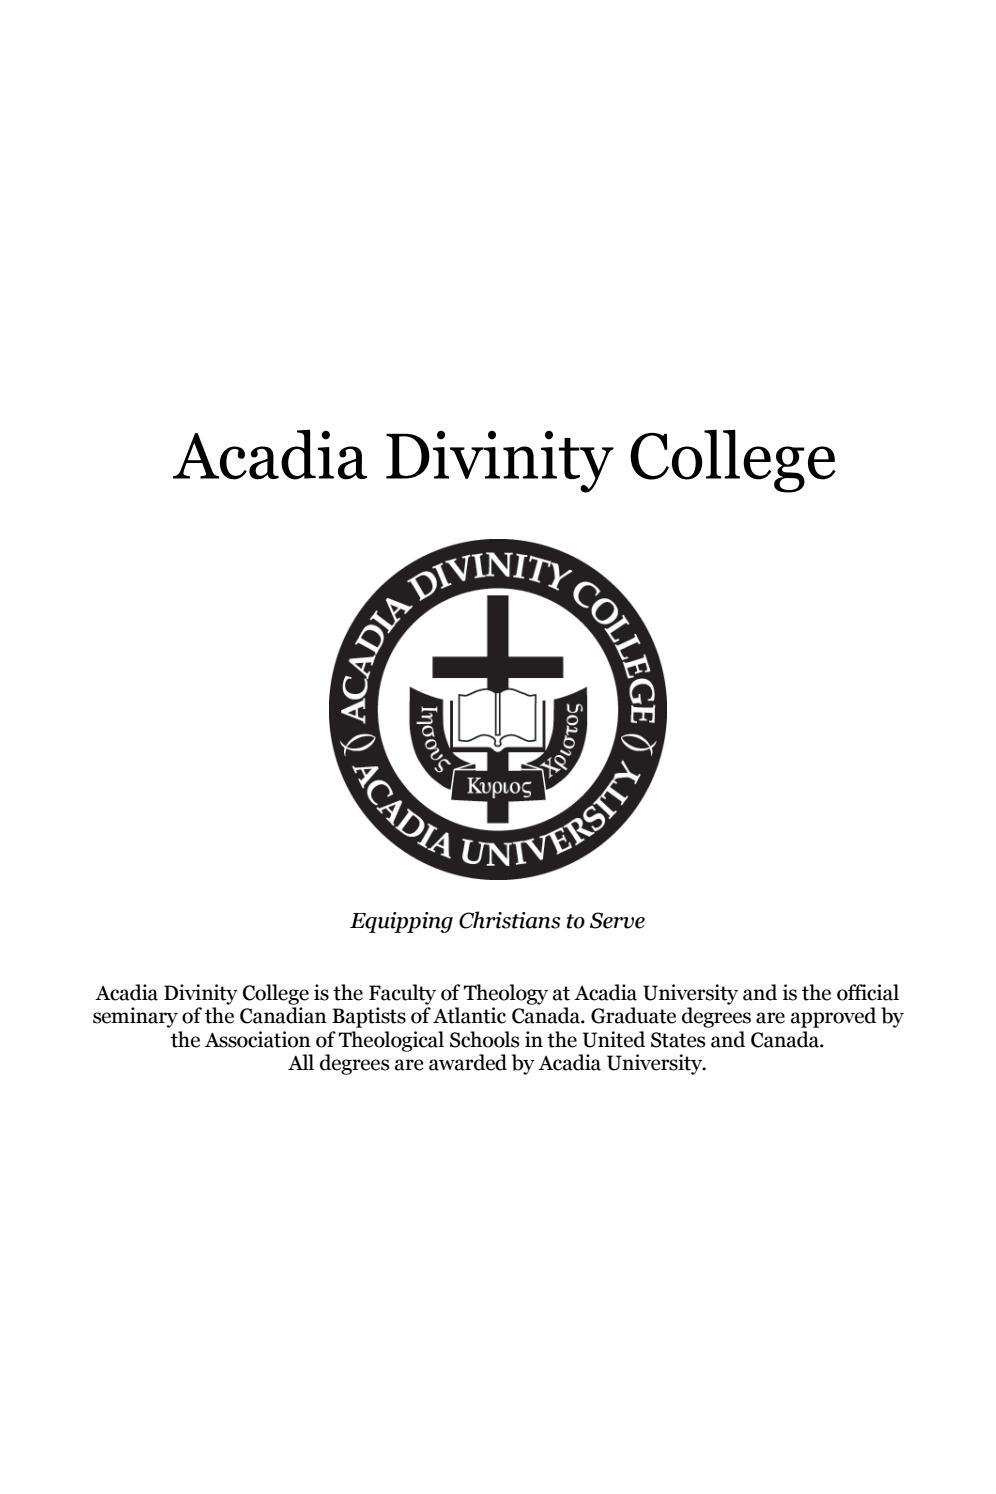 Marshall University Academic Calendar.2017 2018 Adc Academic Calendar By Acadia Divinity College Issuu